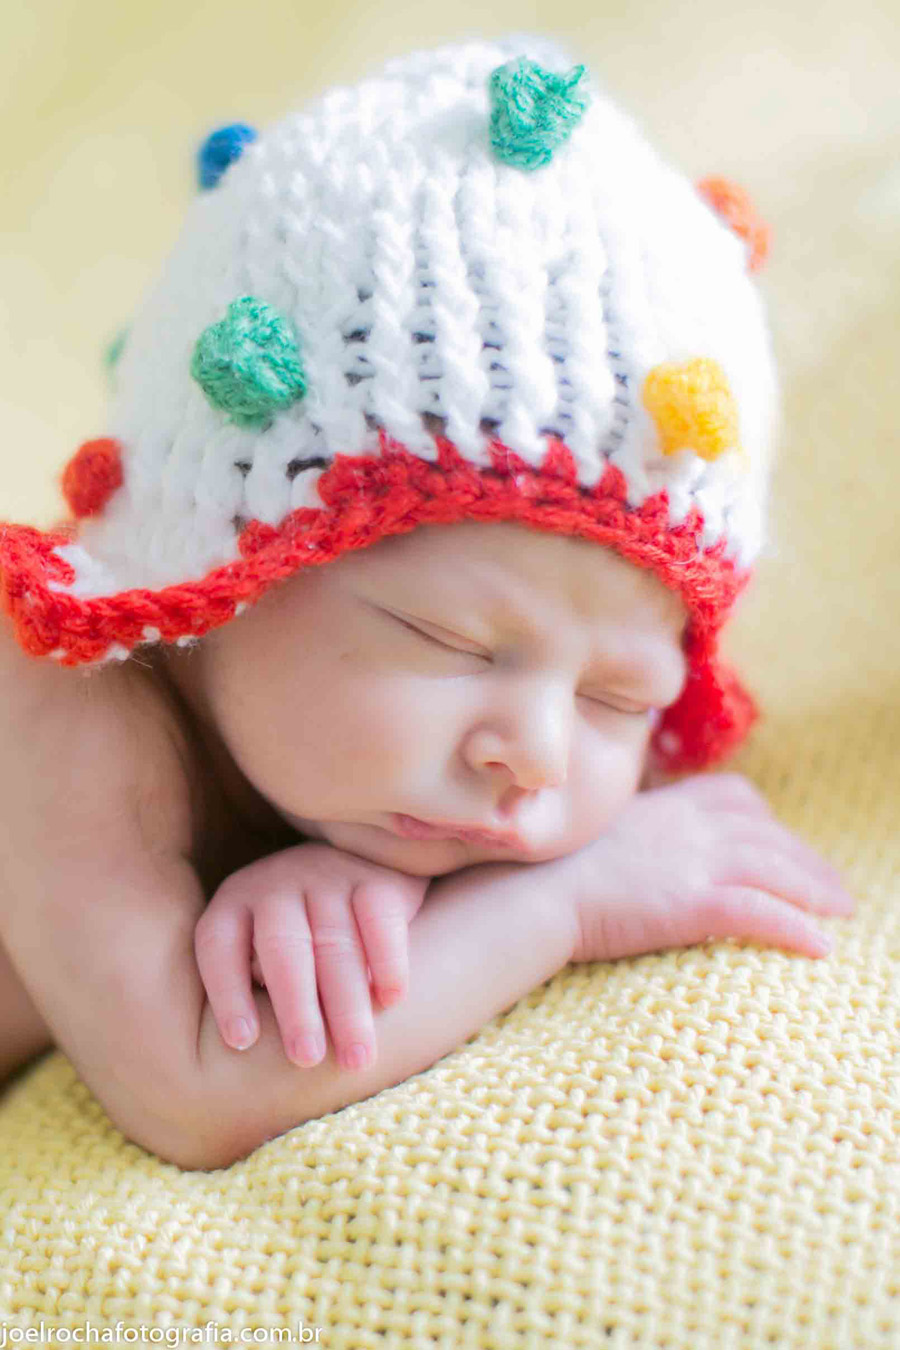 Otávio-newborn-18